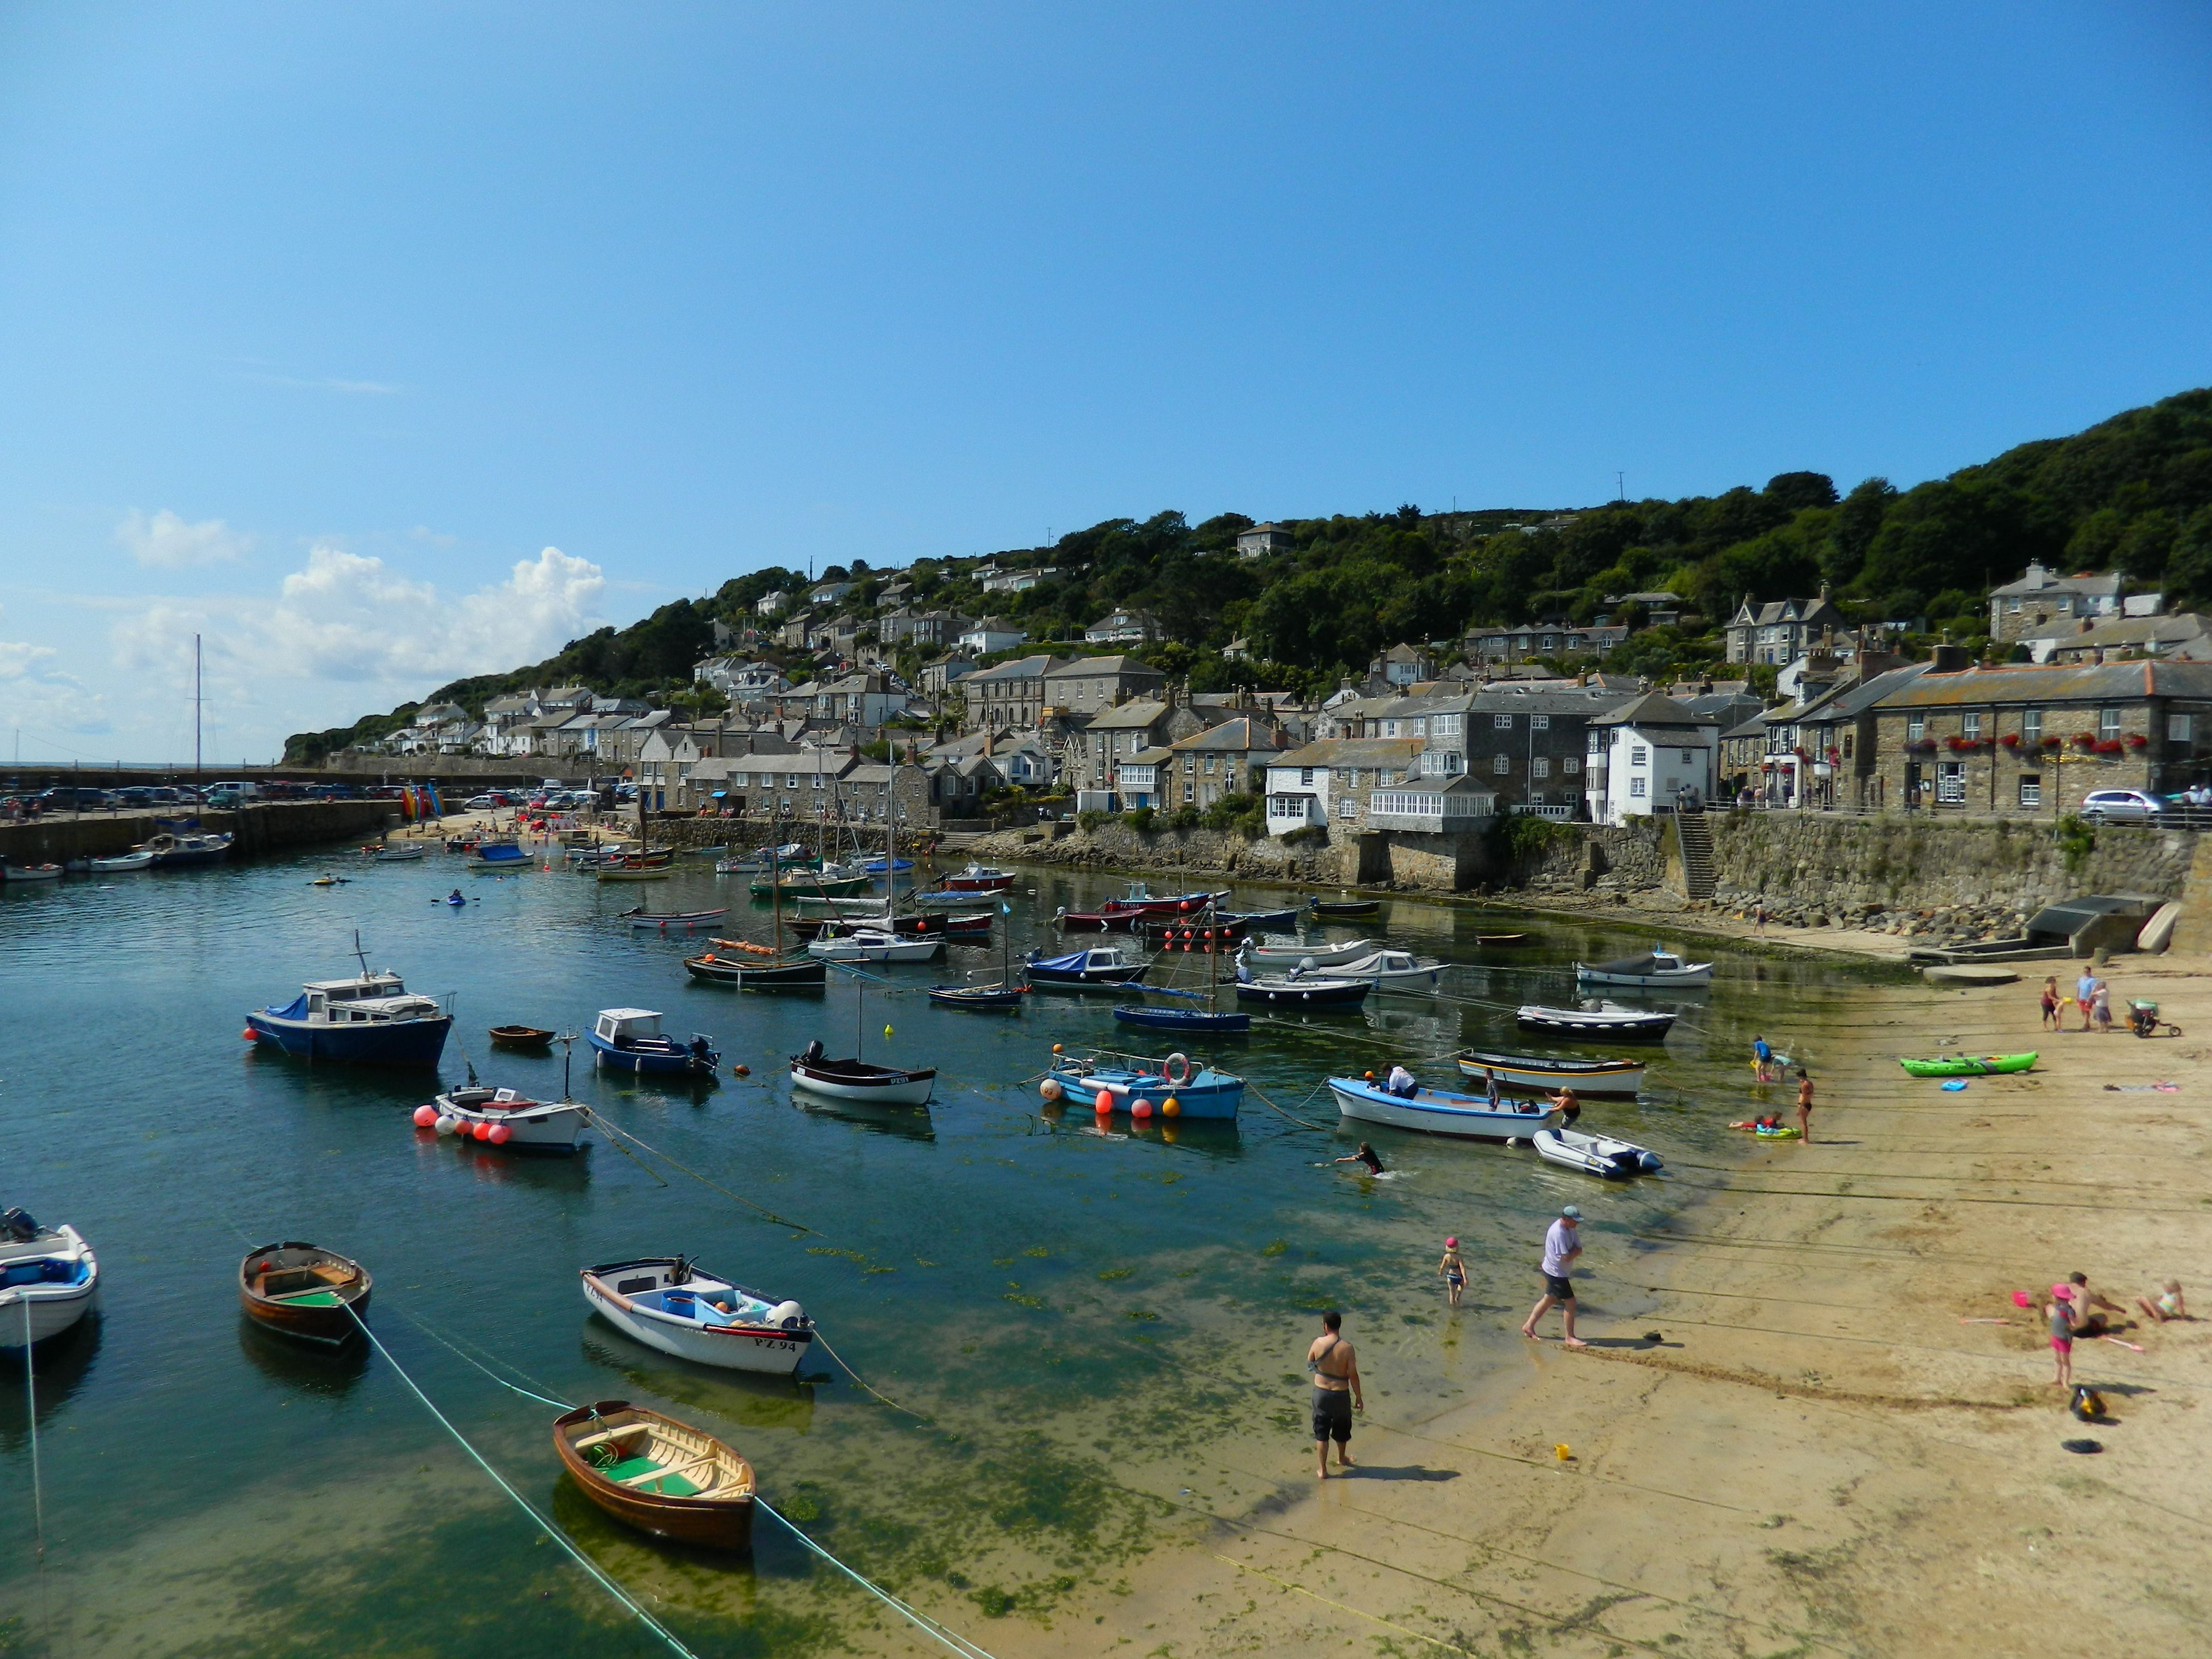 4agosto2014 #Mousehole #Cornwall #England